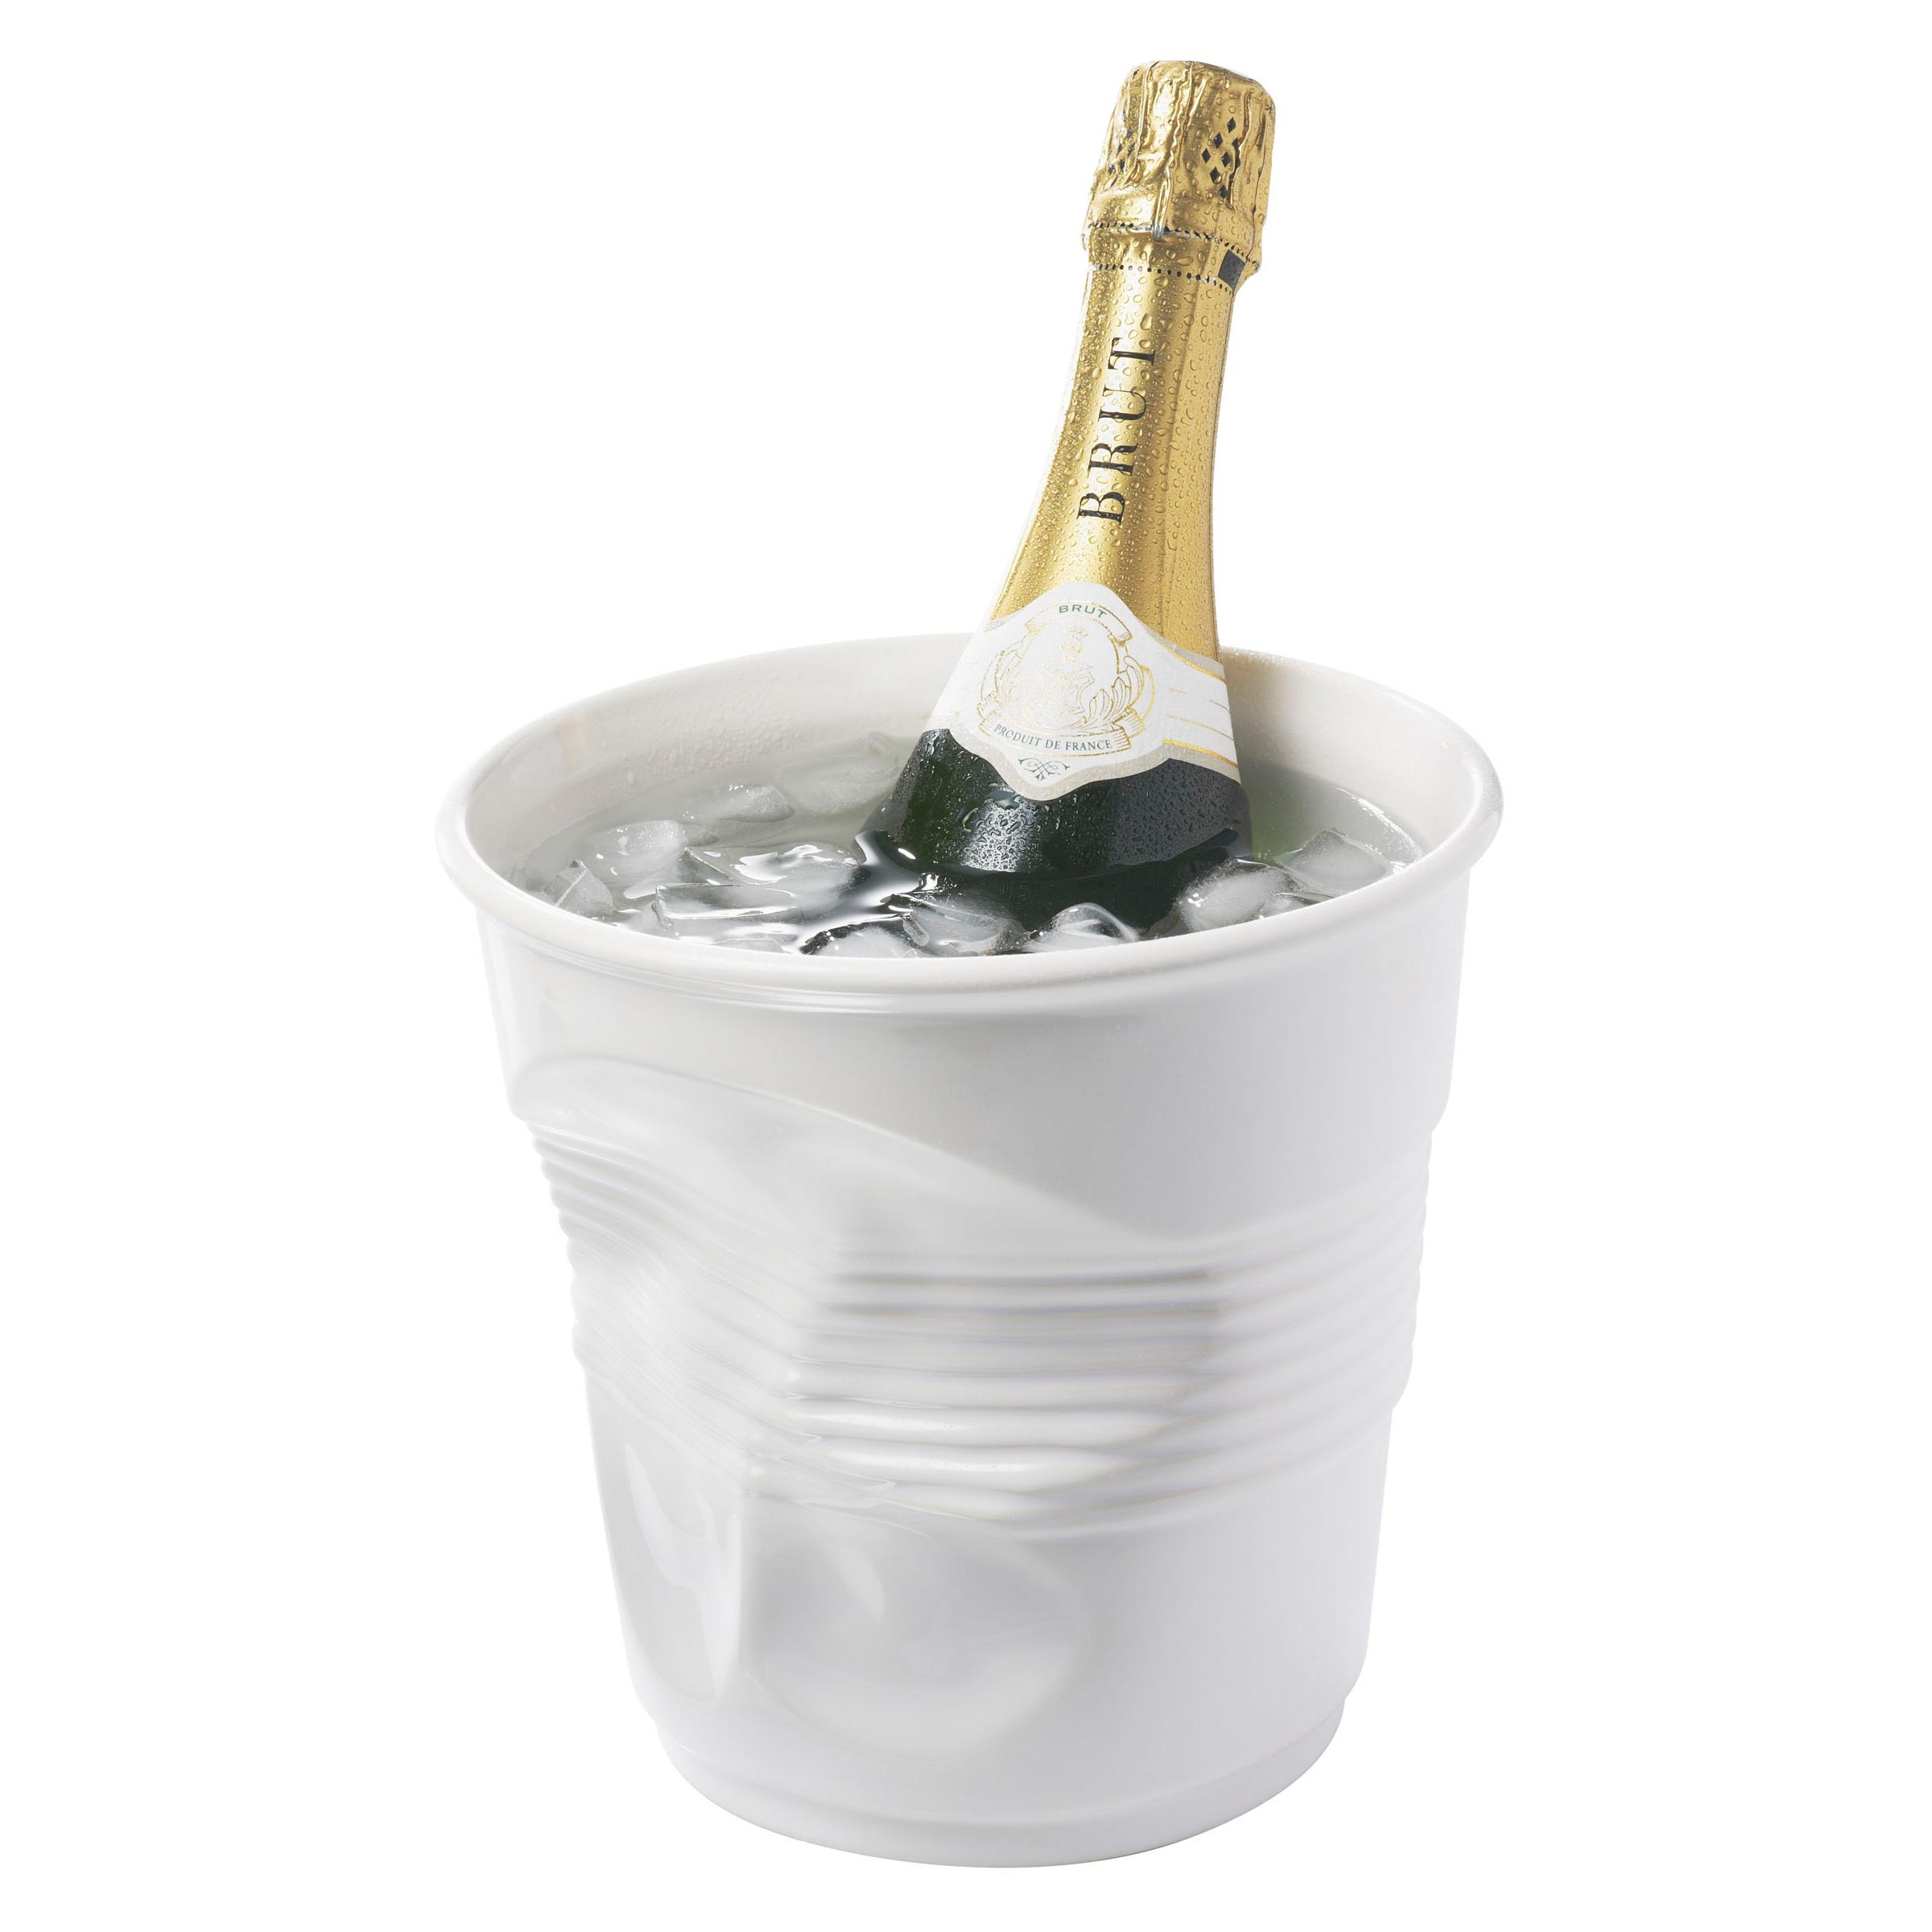 Revol Froisses White Porcelain Crumple Champagne Bucket